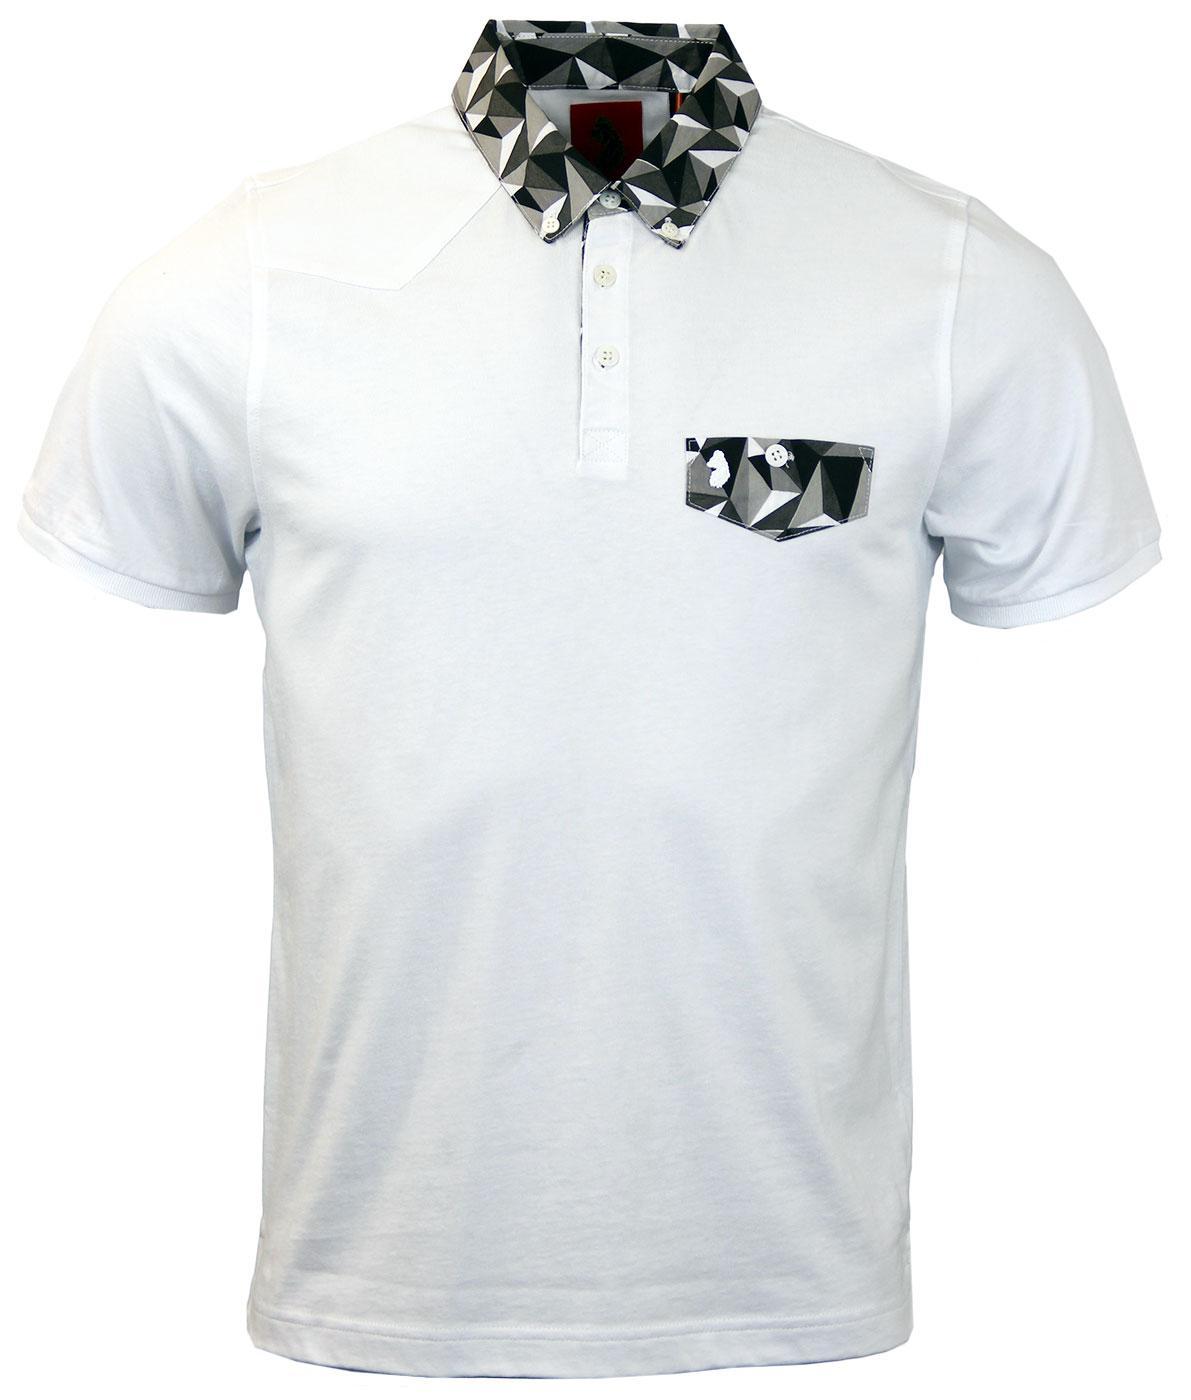 Outlook LUKE 1977 Mod Geo Print Shirt Collar Polo